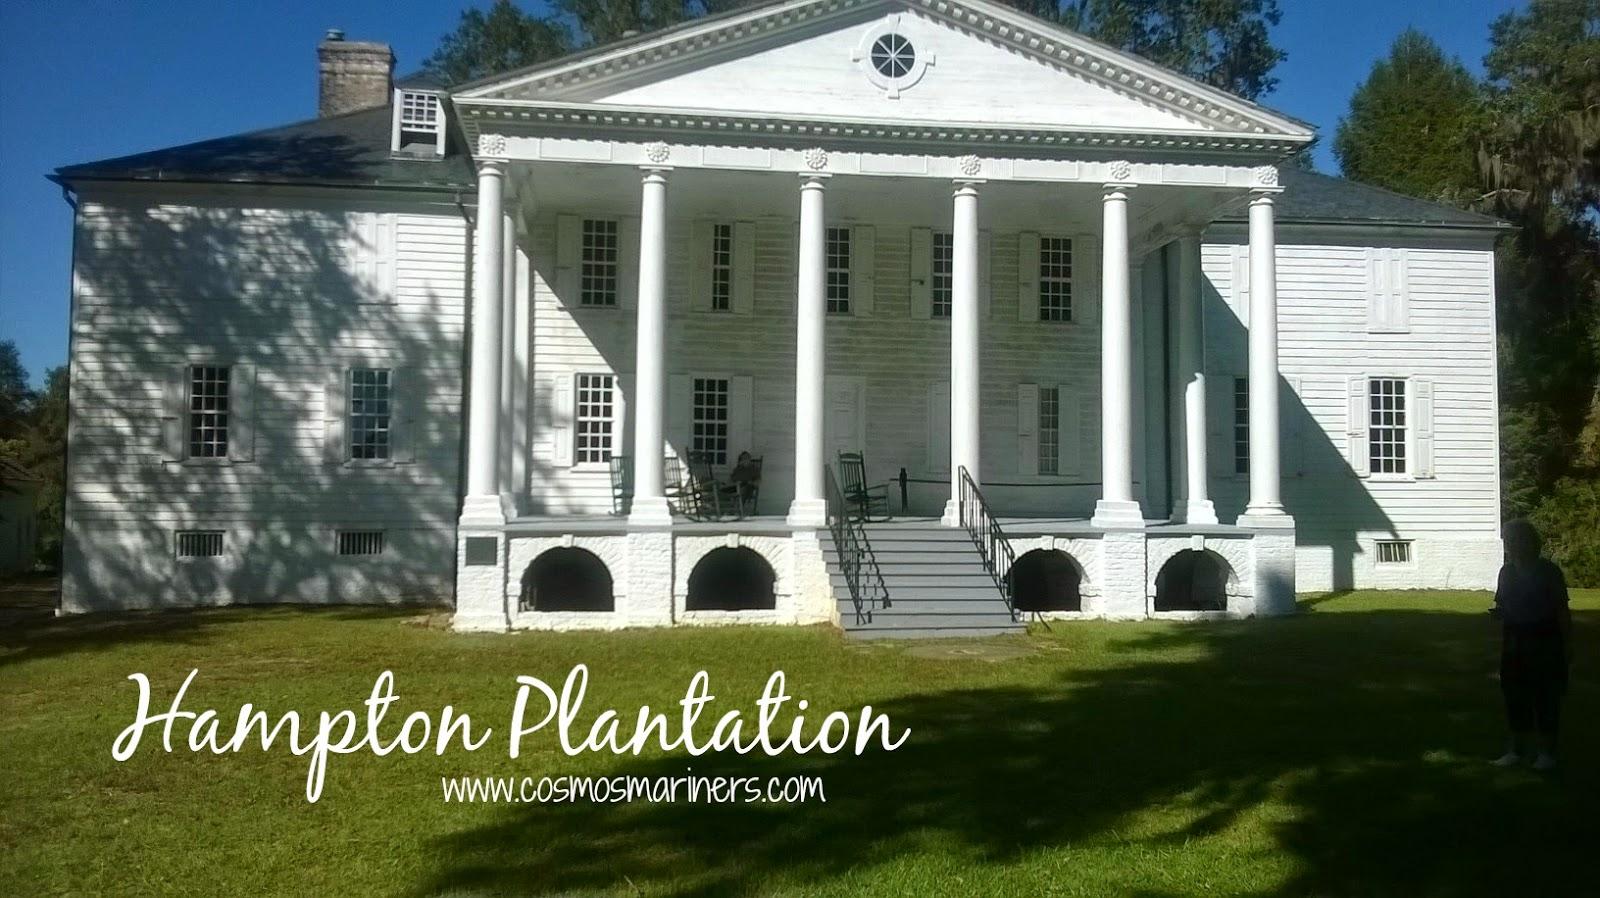 Hampton Plantation, McClellanville, South Carolina | CosmosMariners.com